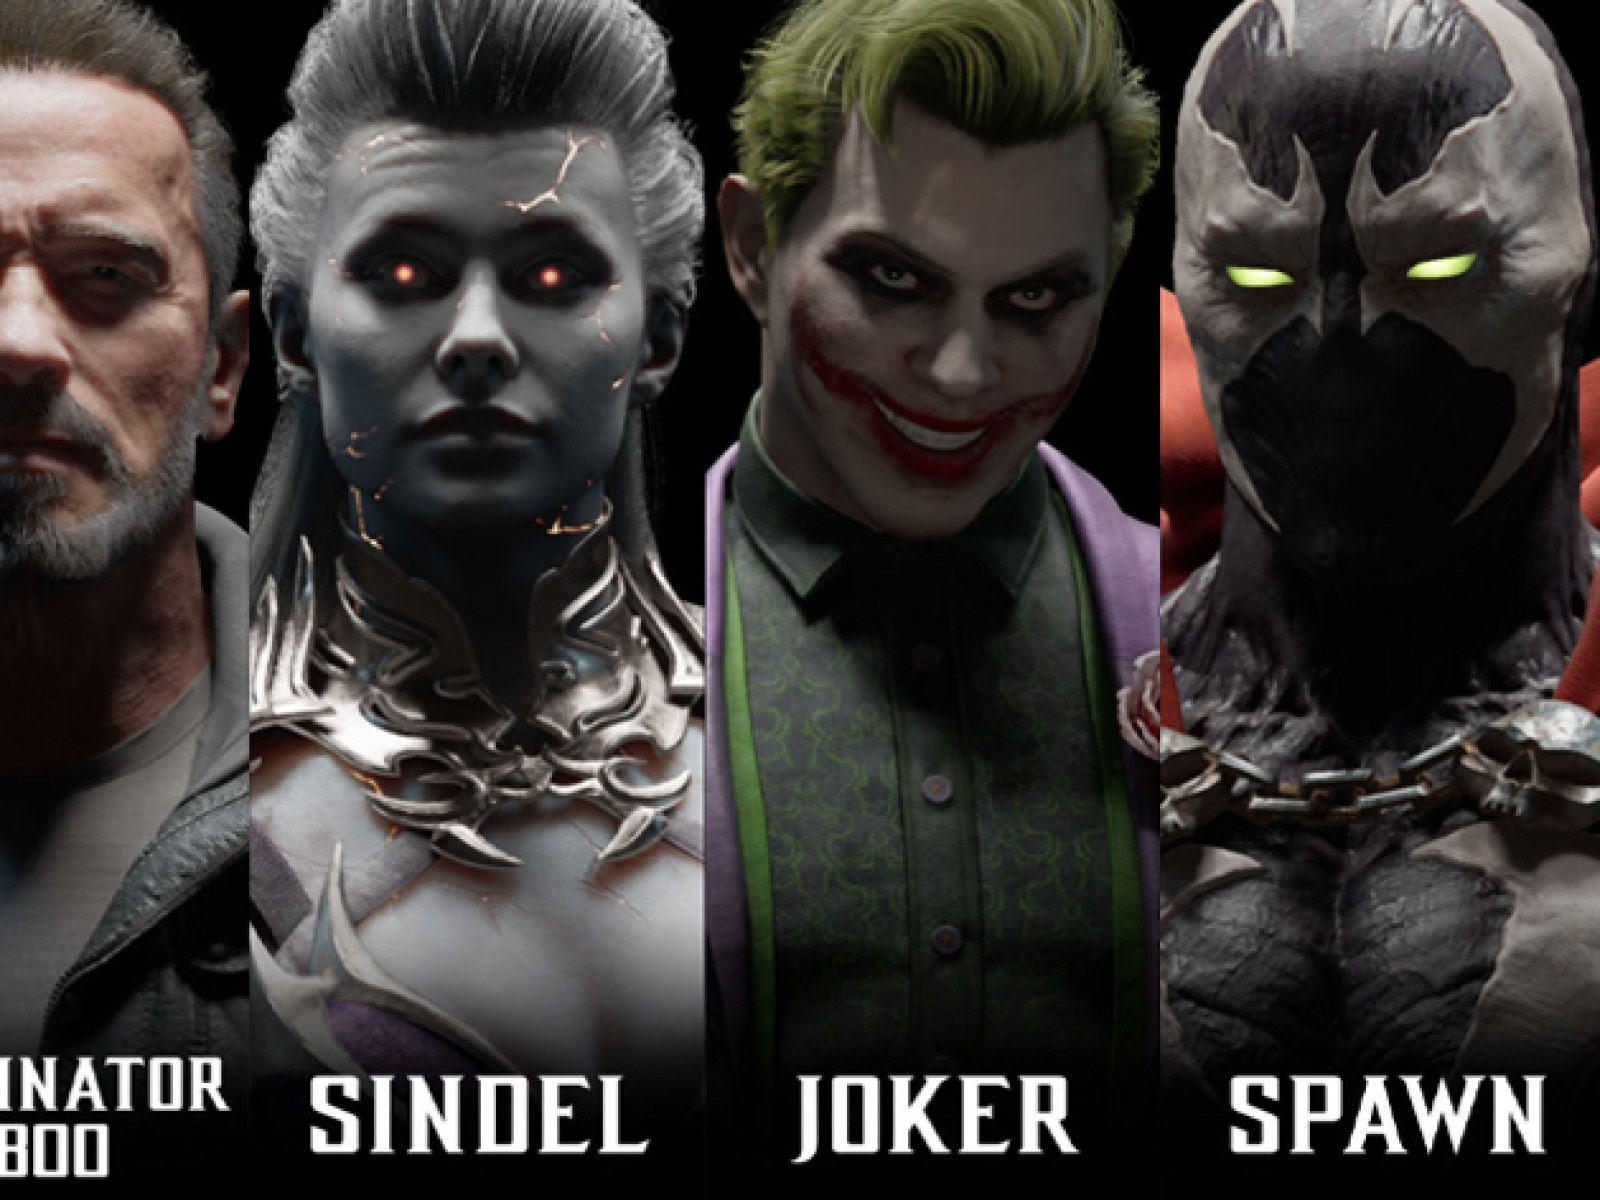 Mortal Kombat 11 Reveals Joker And Terminator As Next Dlc